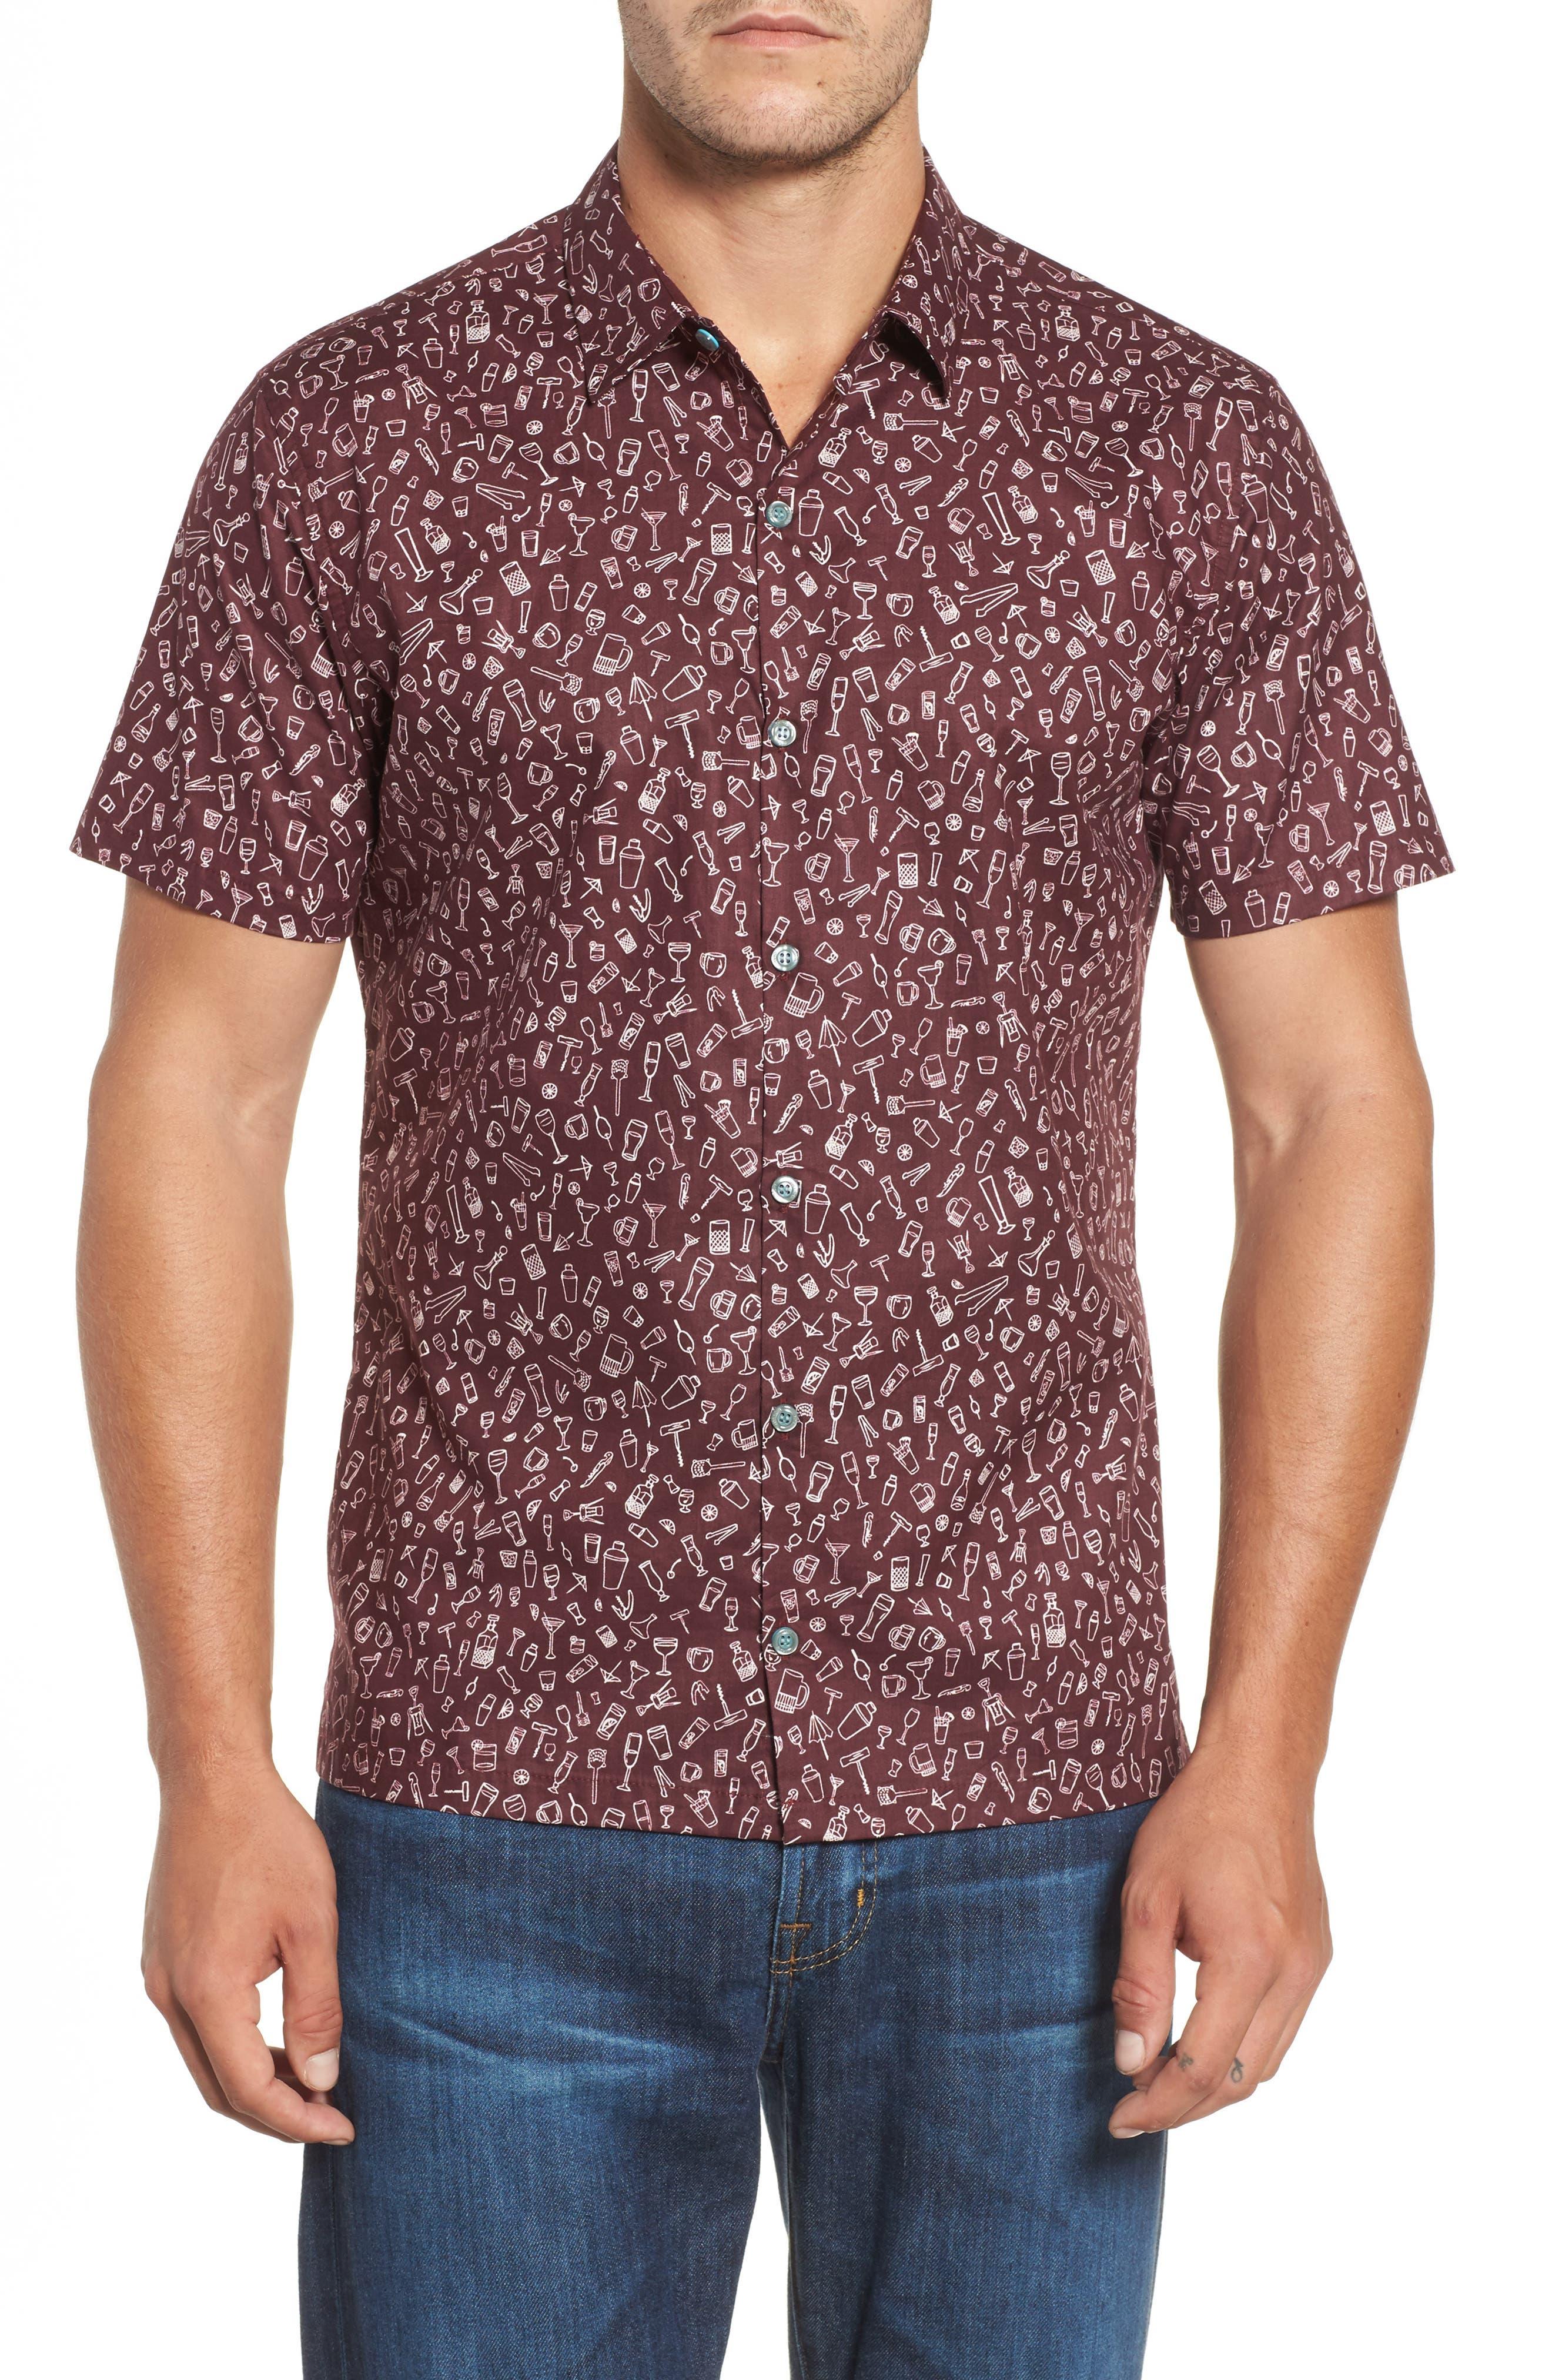 5 PM Slim Fit Camp Shirt,                         Main,                         color, Wine